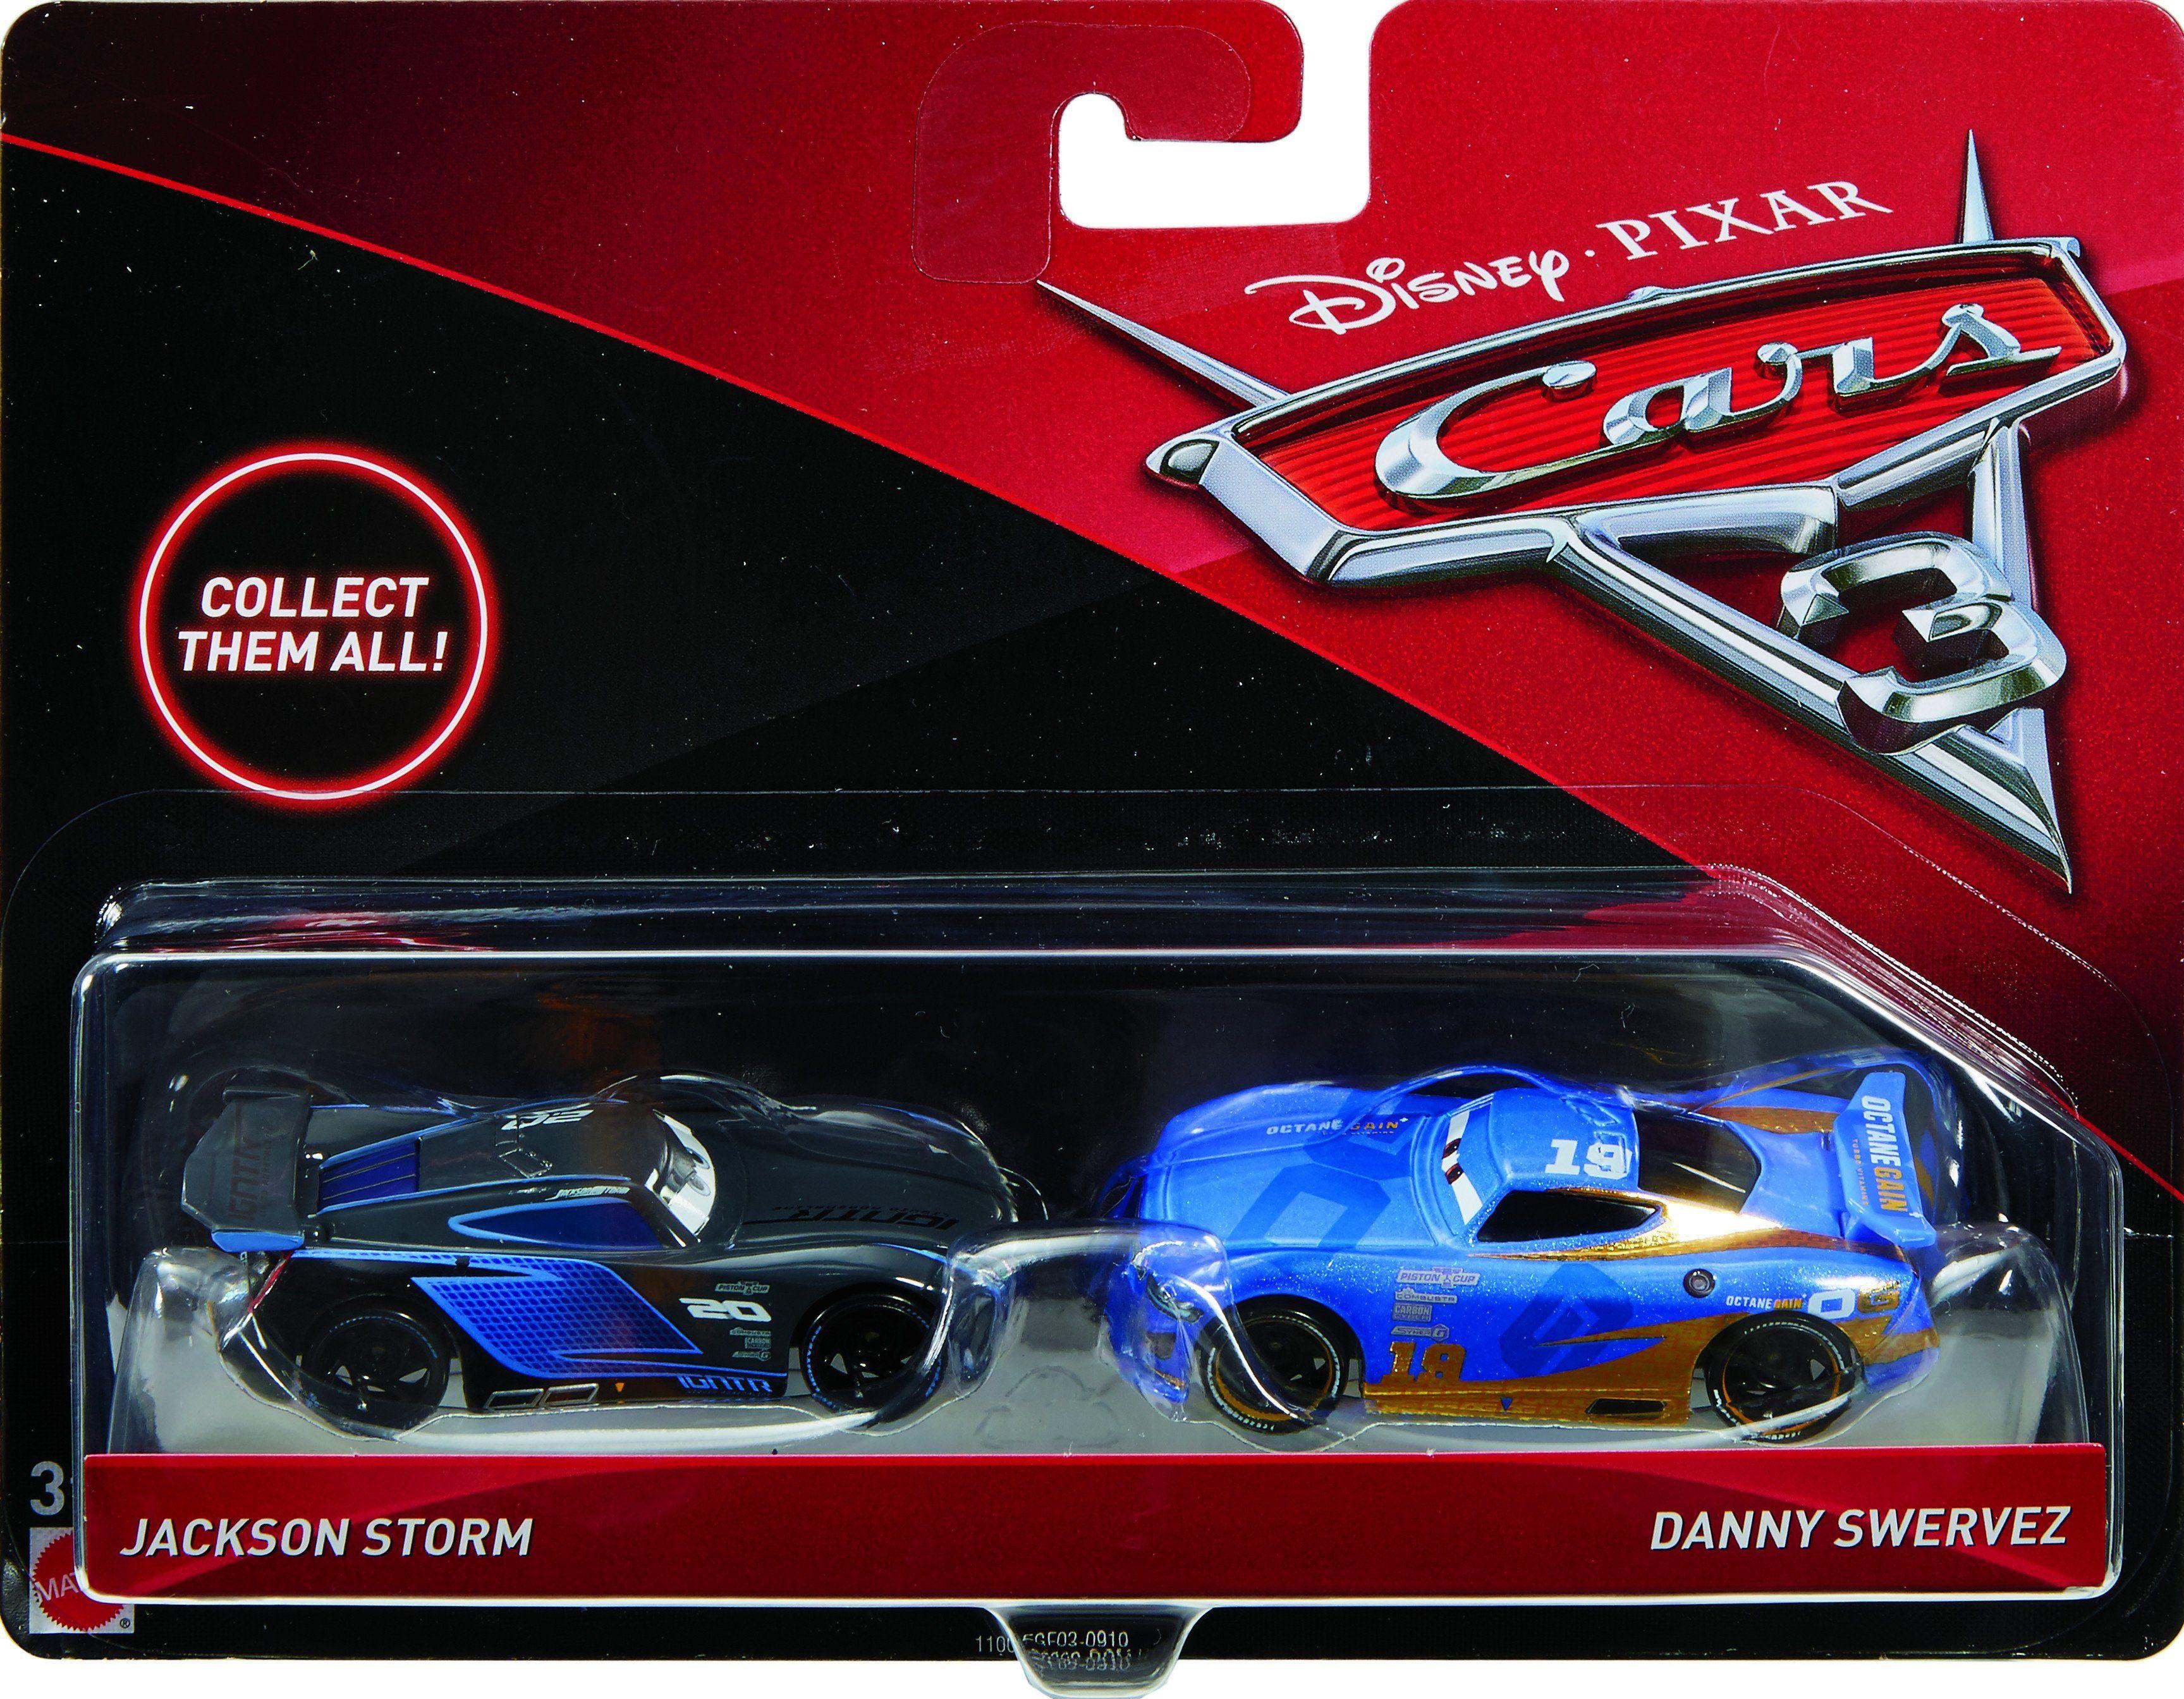 Pin By Pamela Galan On Zxx Disney Pixar Cars Disney Cars Pixar